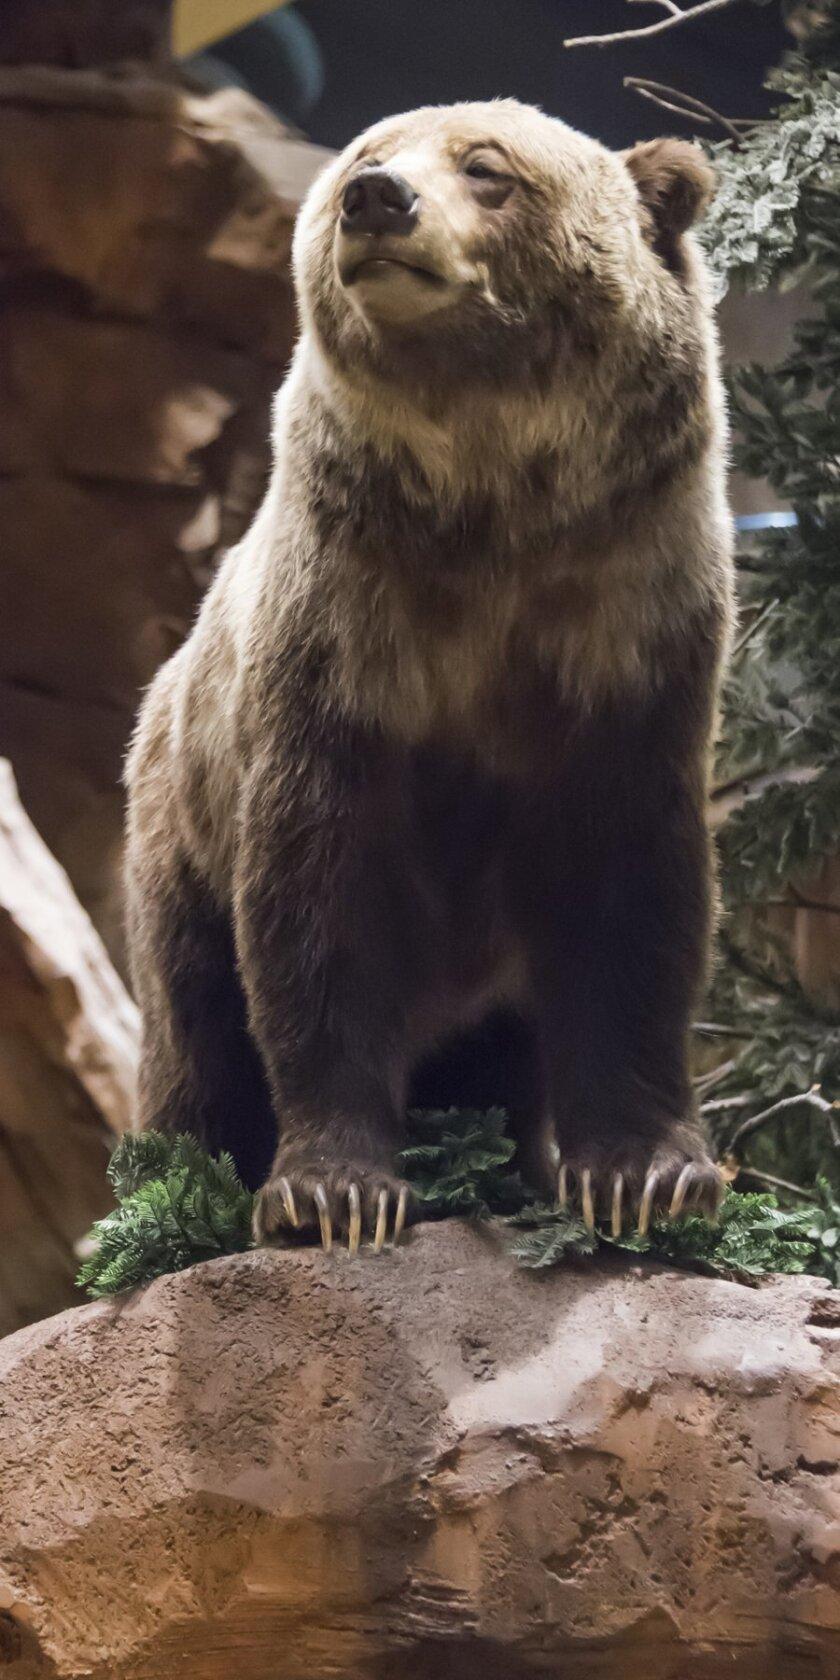 Bear in Outdoor World.